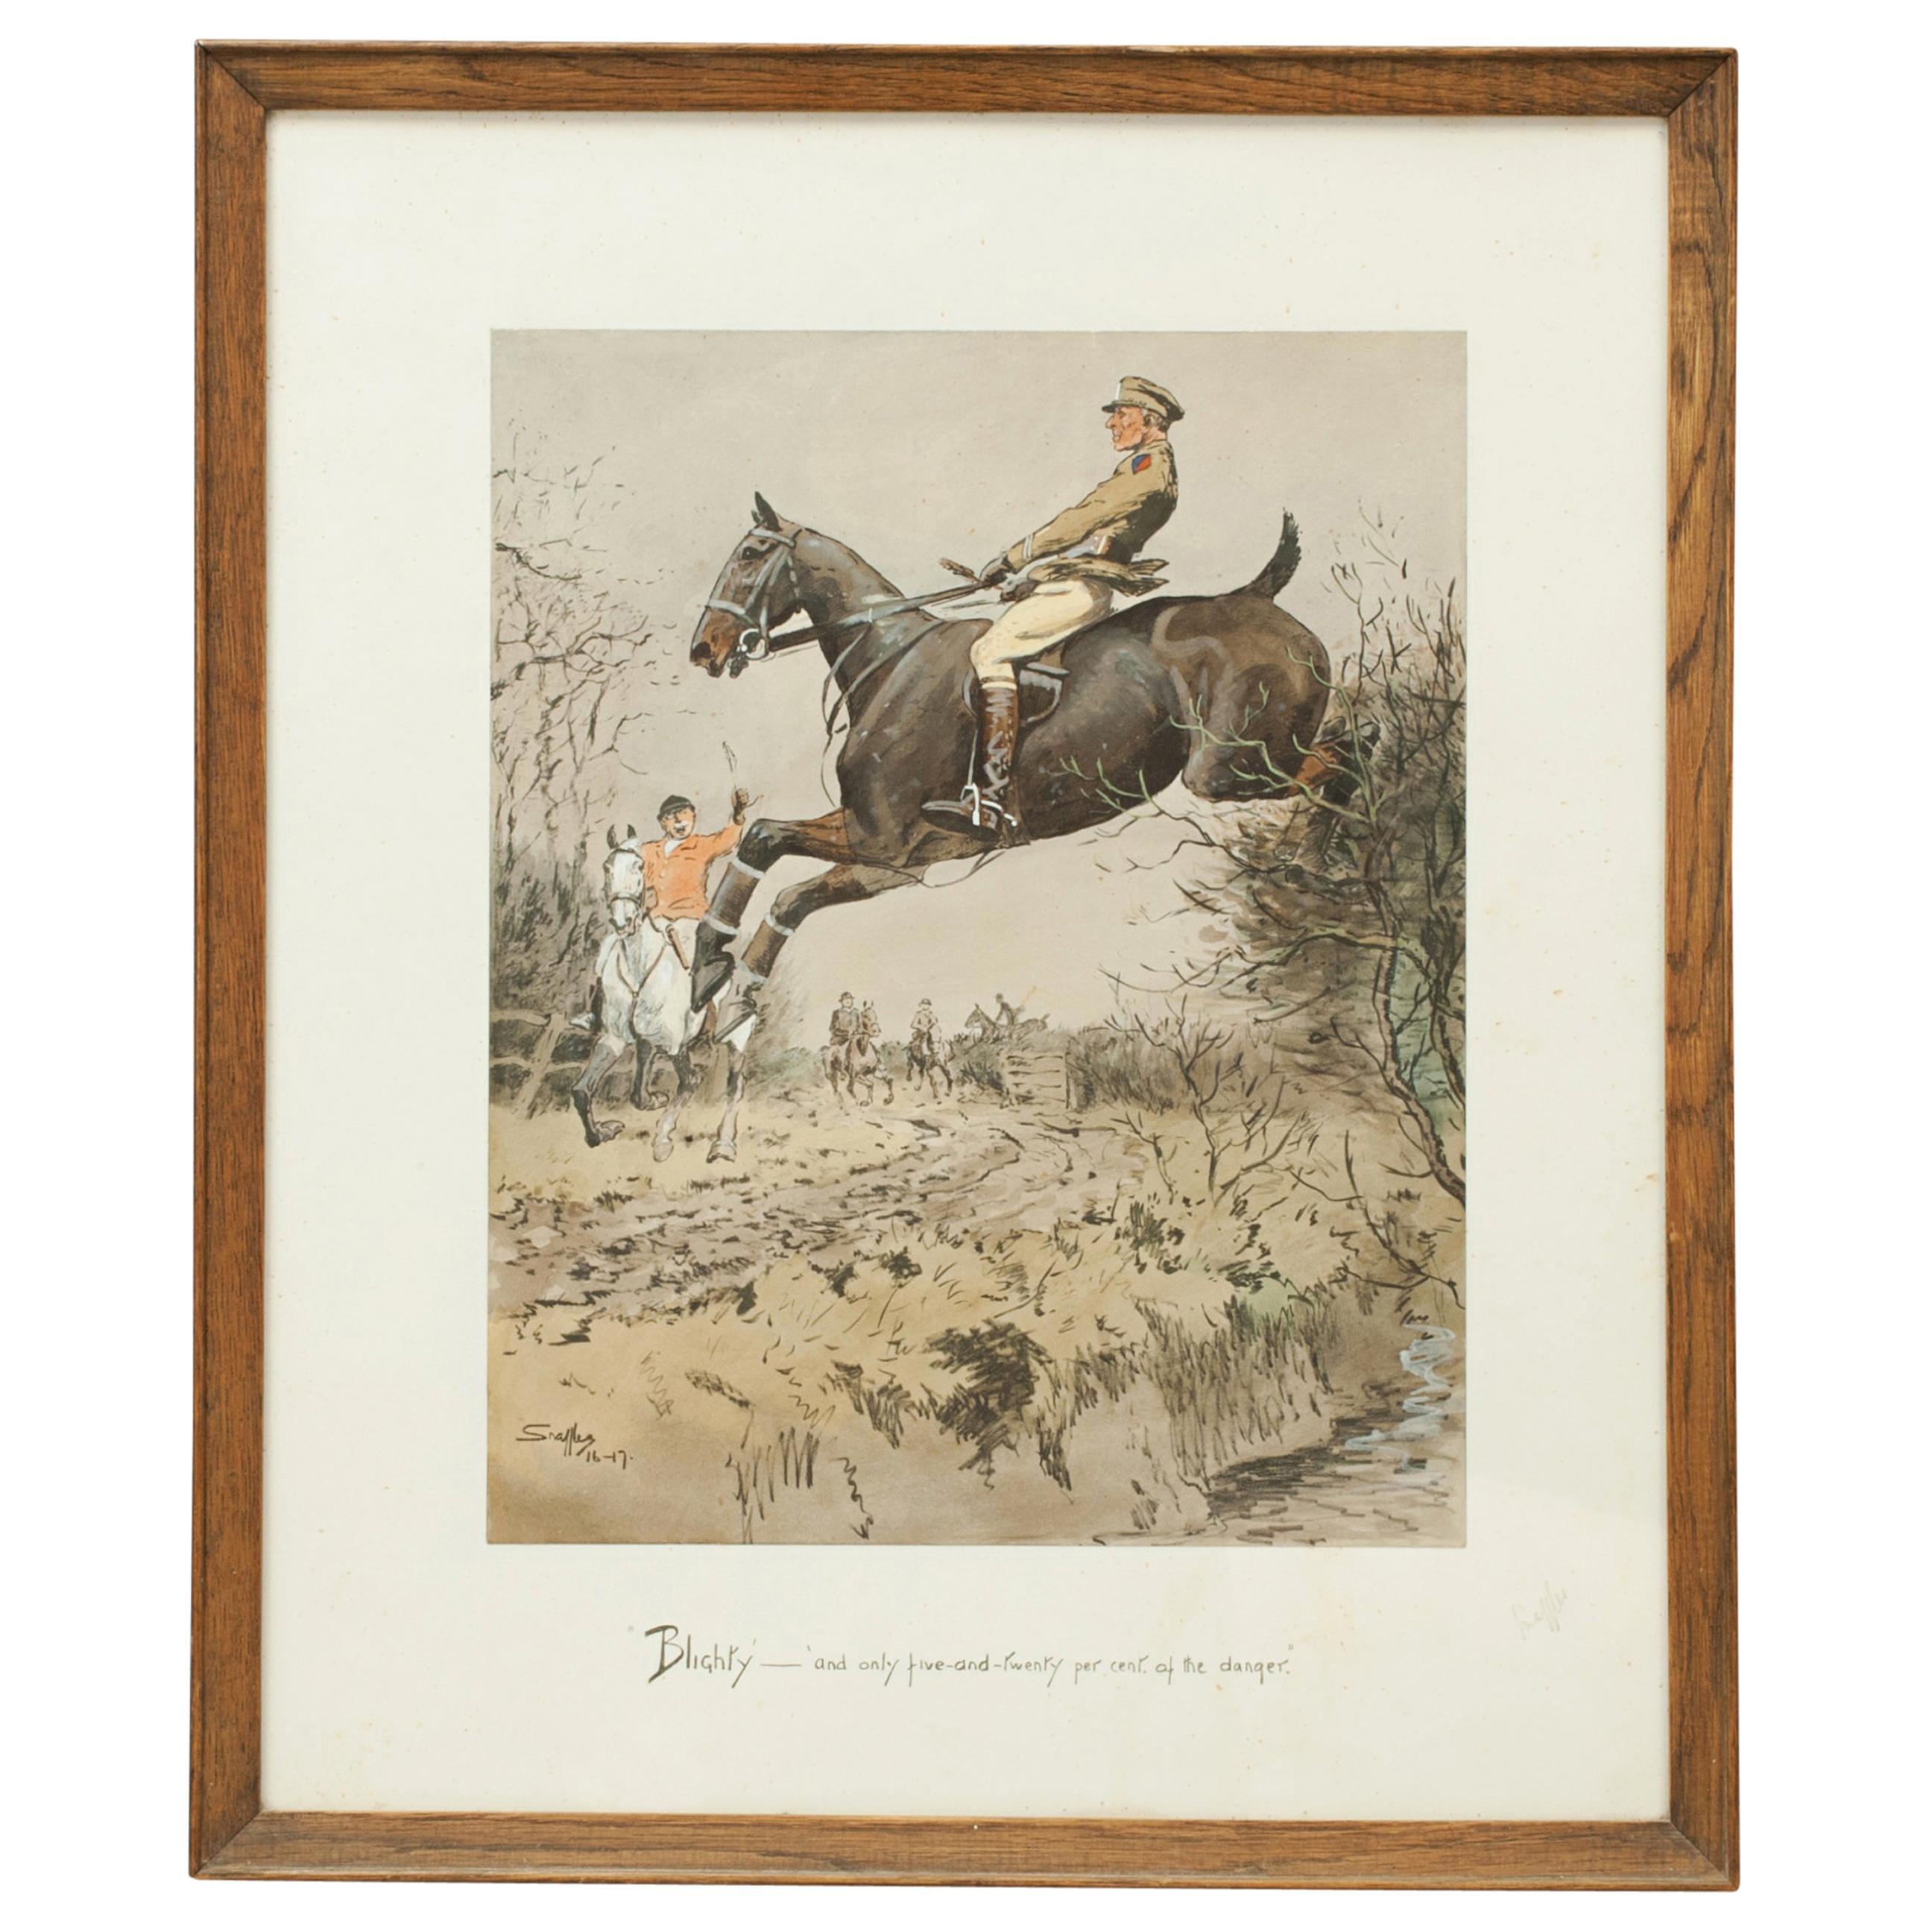 Antique Snaffles World War 1 Military Print, Blighty